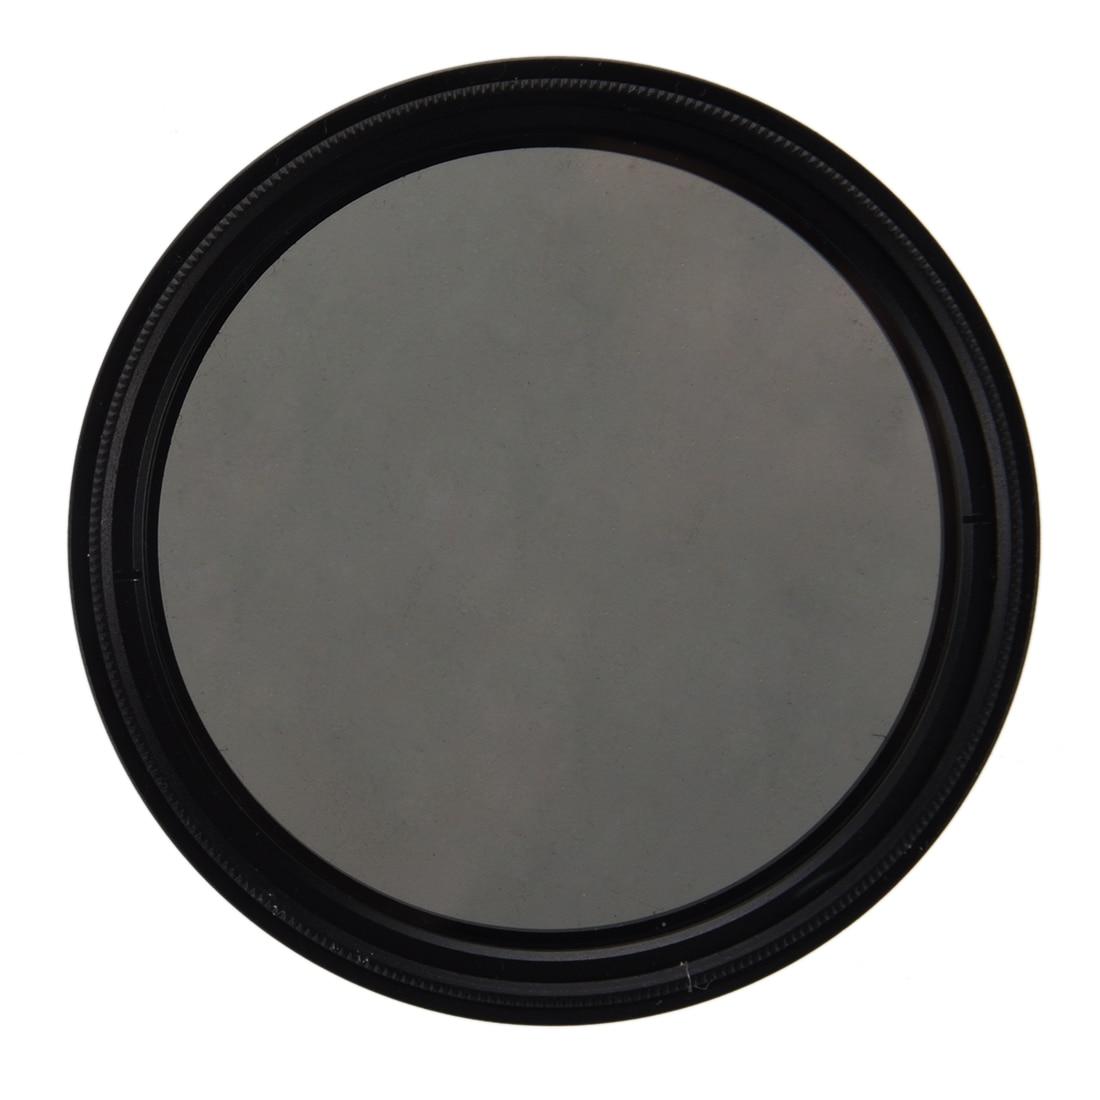 52mm Adjustable Neutral Density ND Fader Filter ND2 ND4 ND8 to ND400